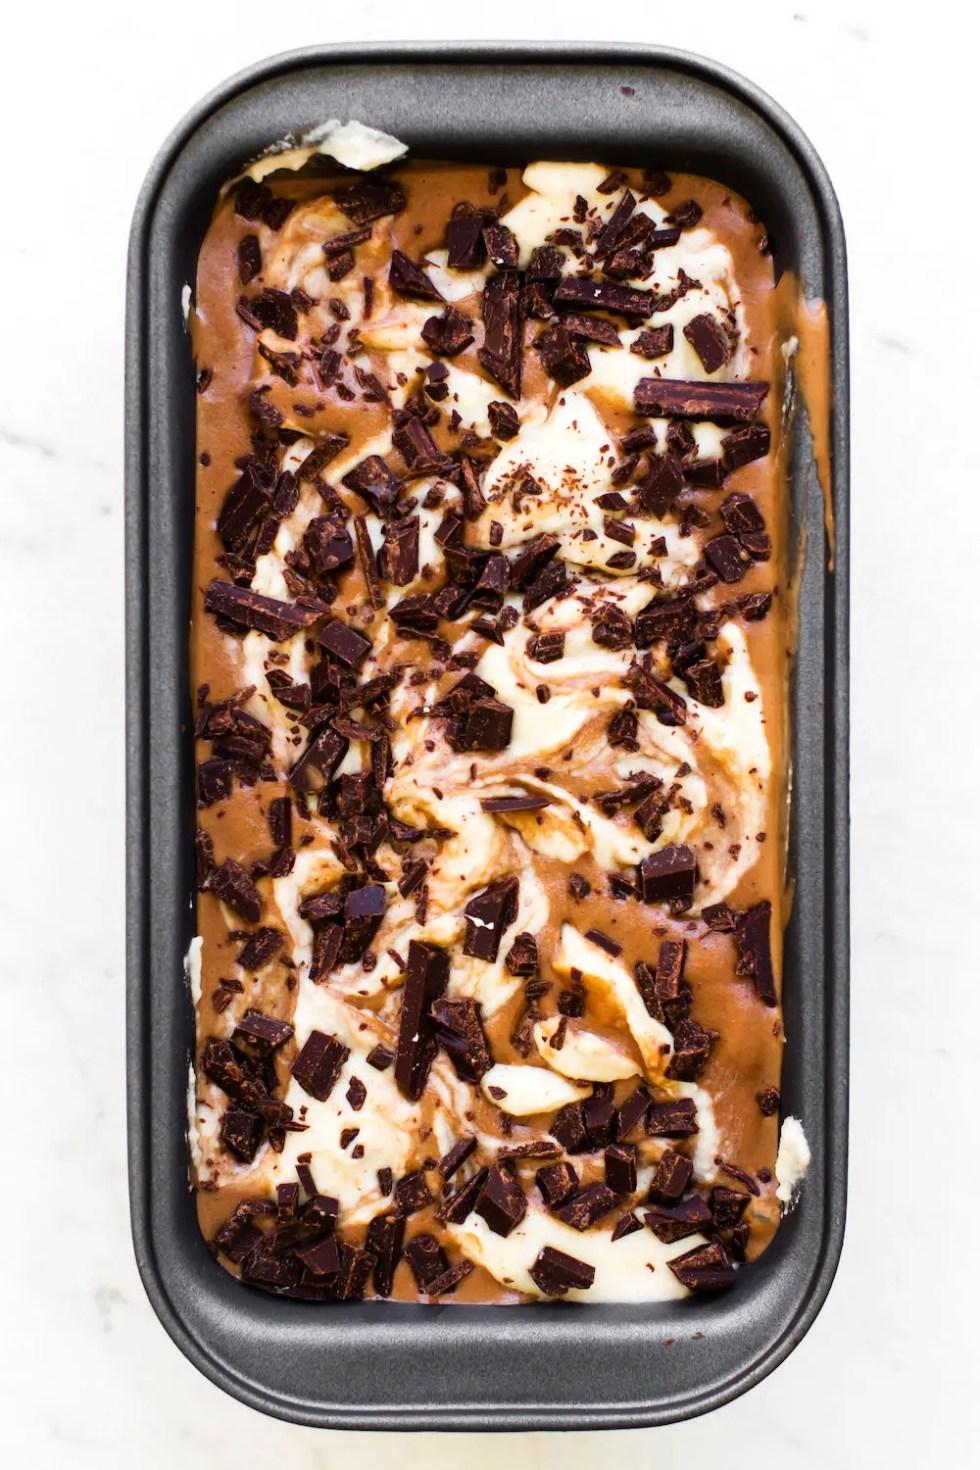 Vegan French Silk Ice Cream (no-churn!)